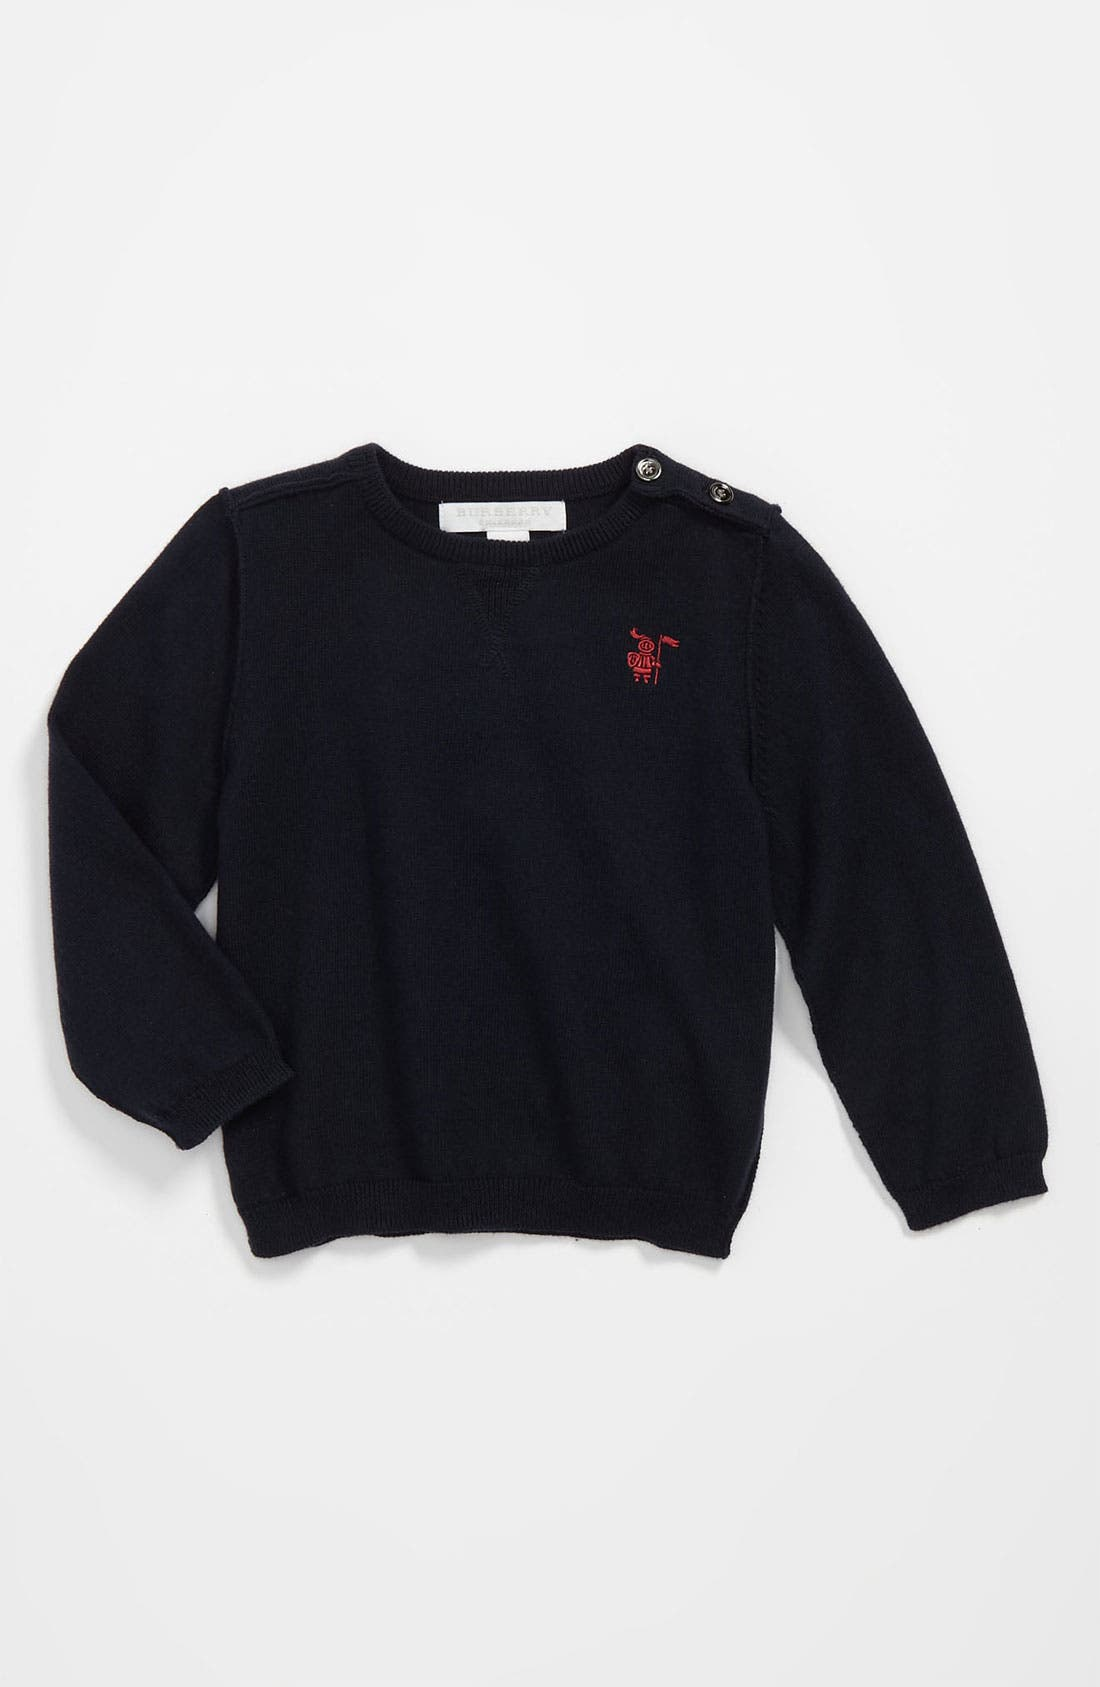 Alternate Image 1 Selected - Burberry 'Mini Kane' Sweater (Baby)